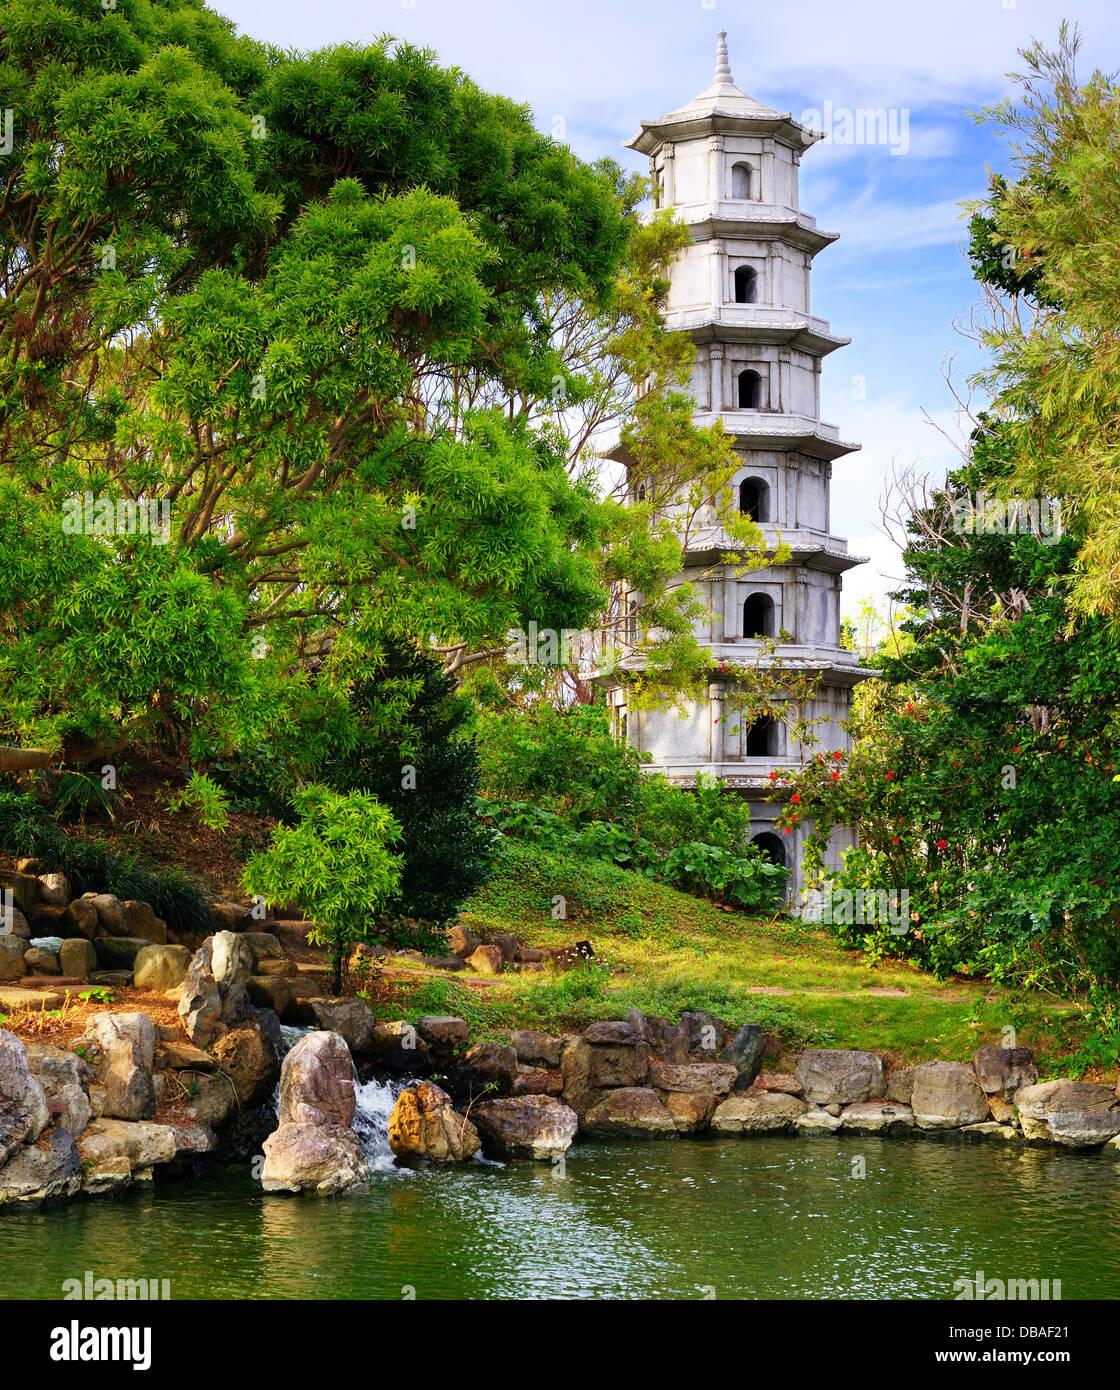 Fukushuen Garden in Naha, Okinawa, Japan. - Stock Image